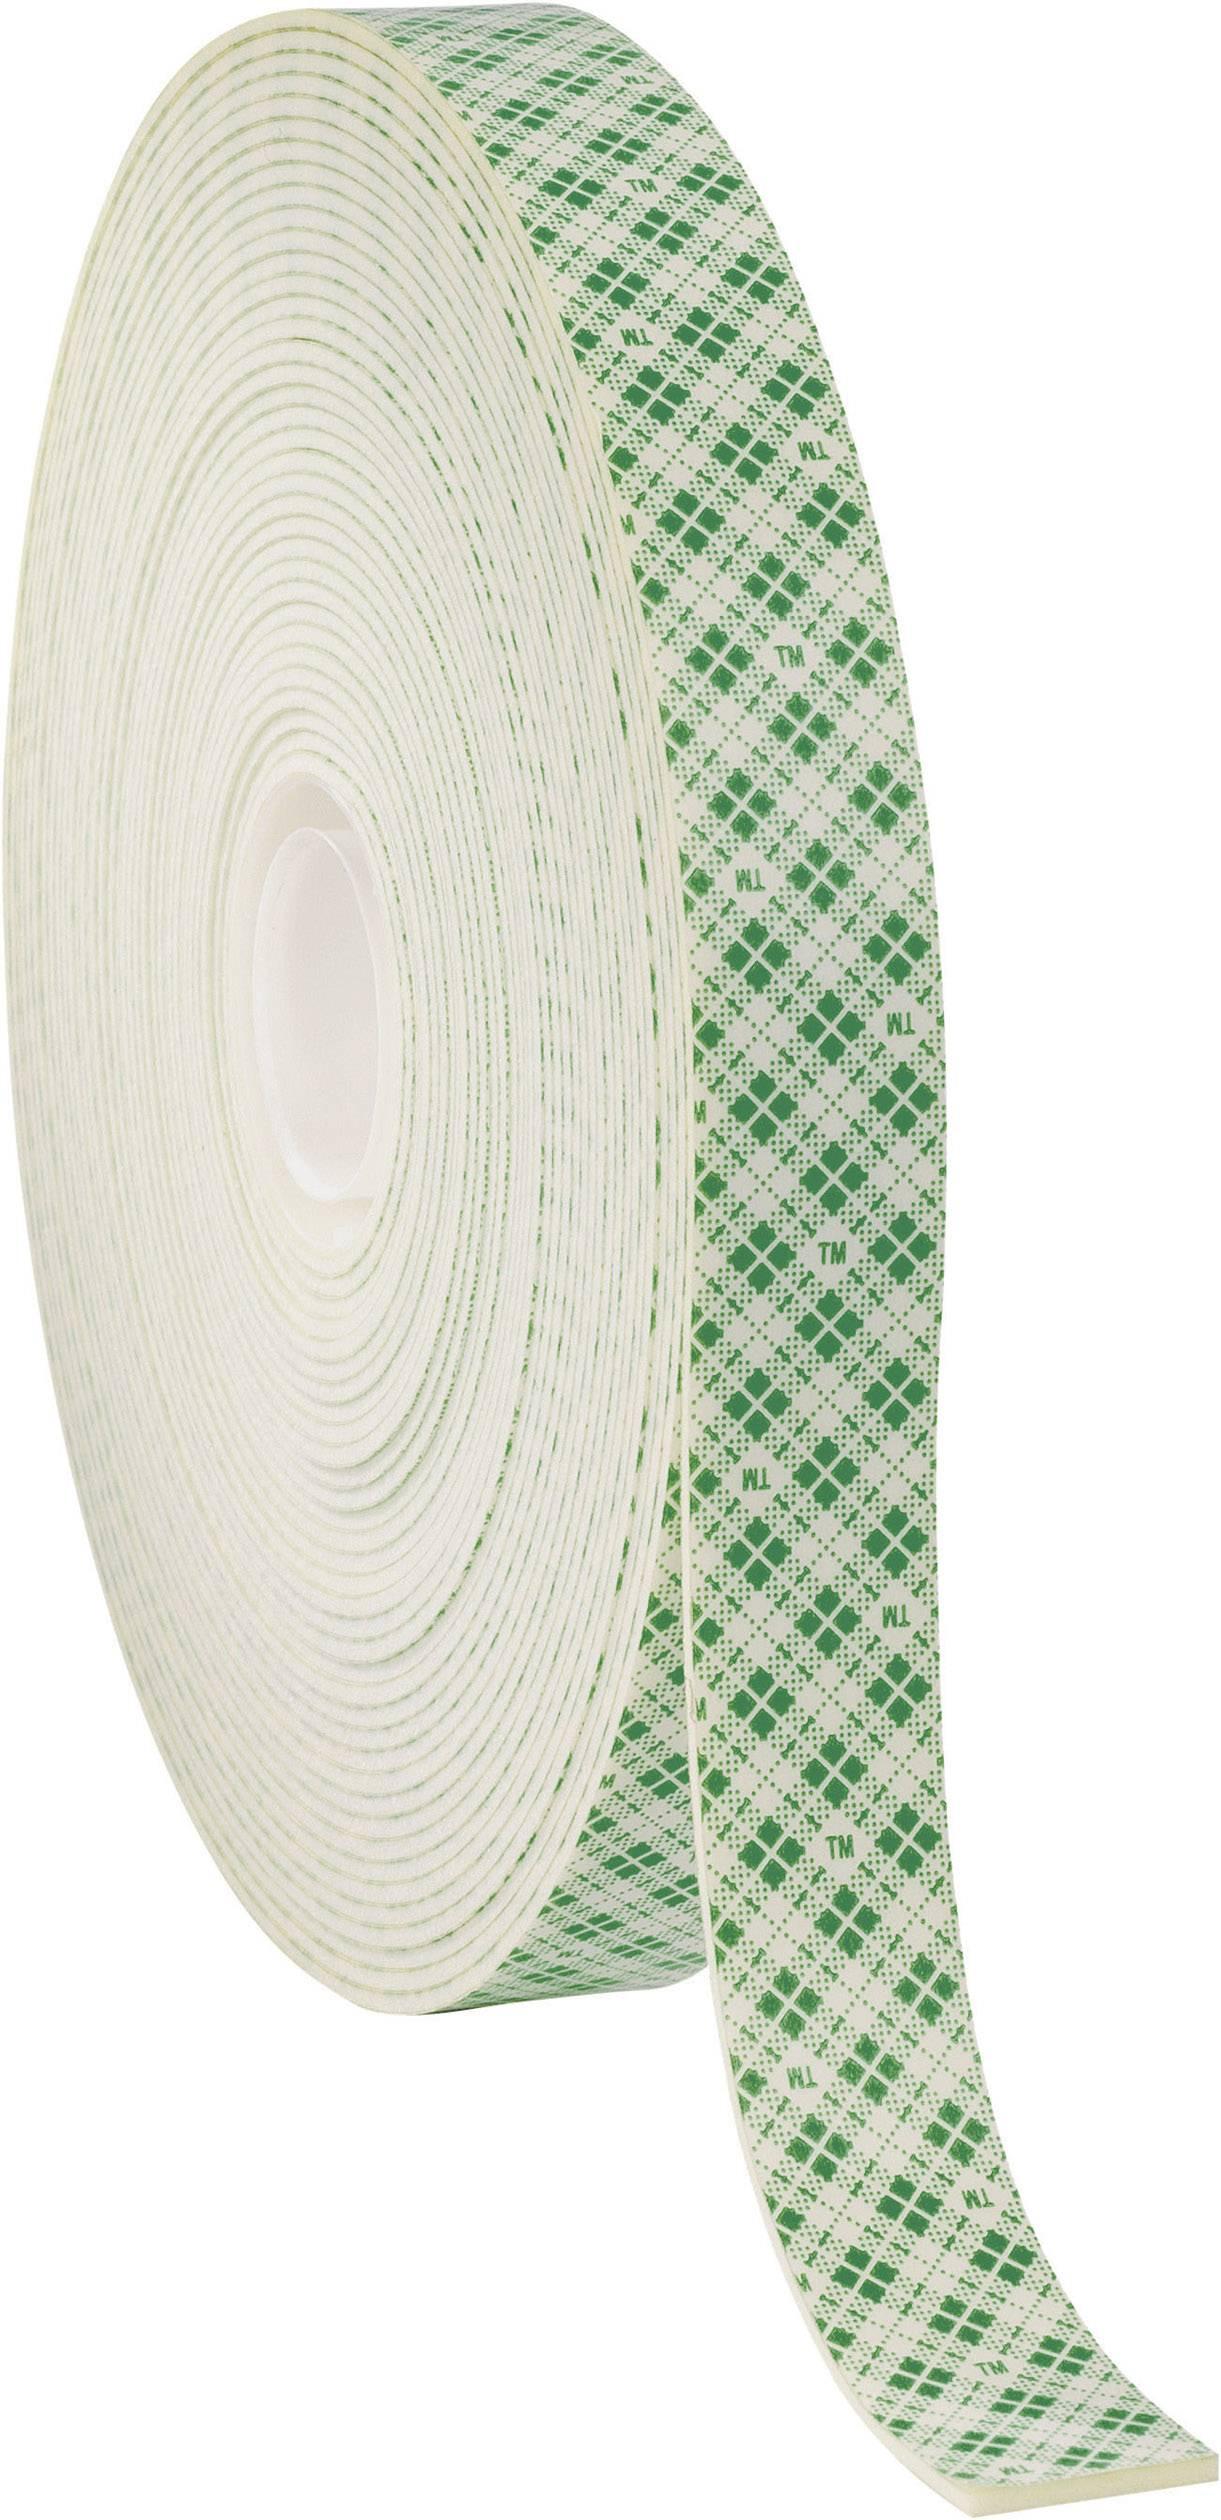 Obojstranná lepiaca páska 3M 4026 FT-0024-8104-0, (d x š) 33 m x 15 mm, krémová, 1 roliek